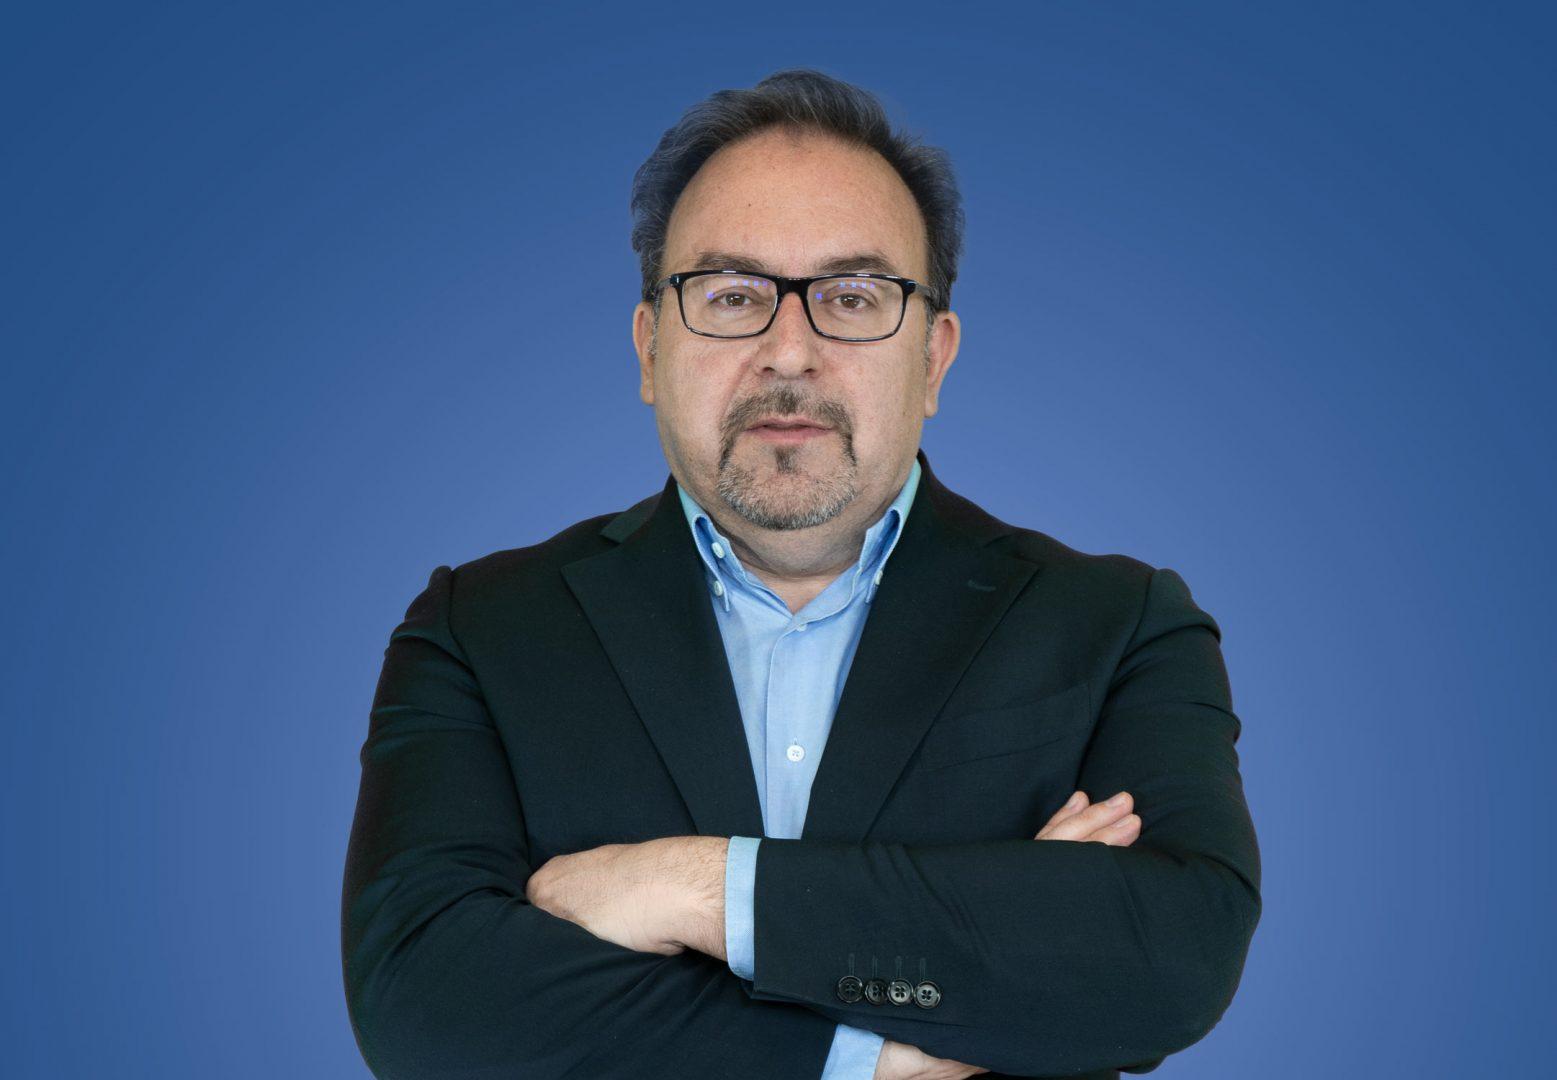 Gianluigi Mazzi